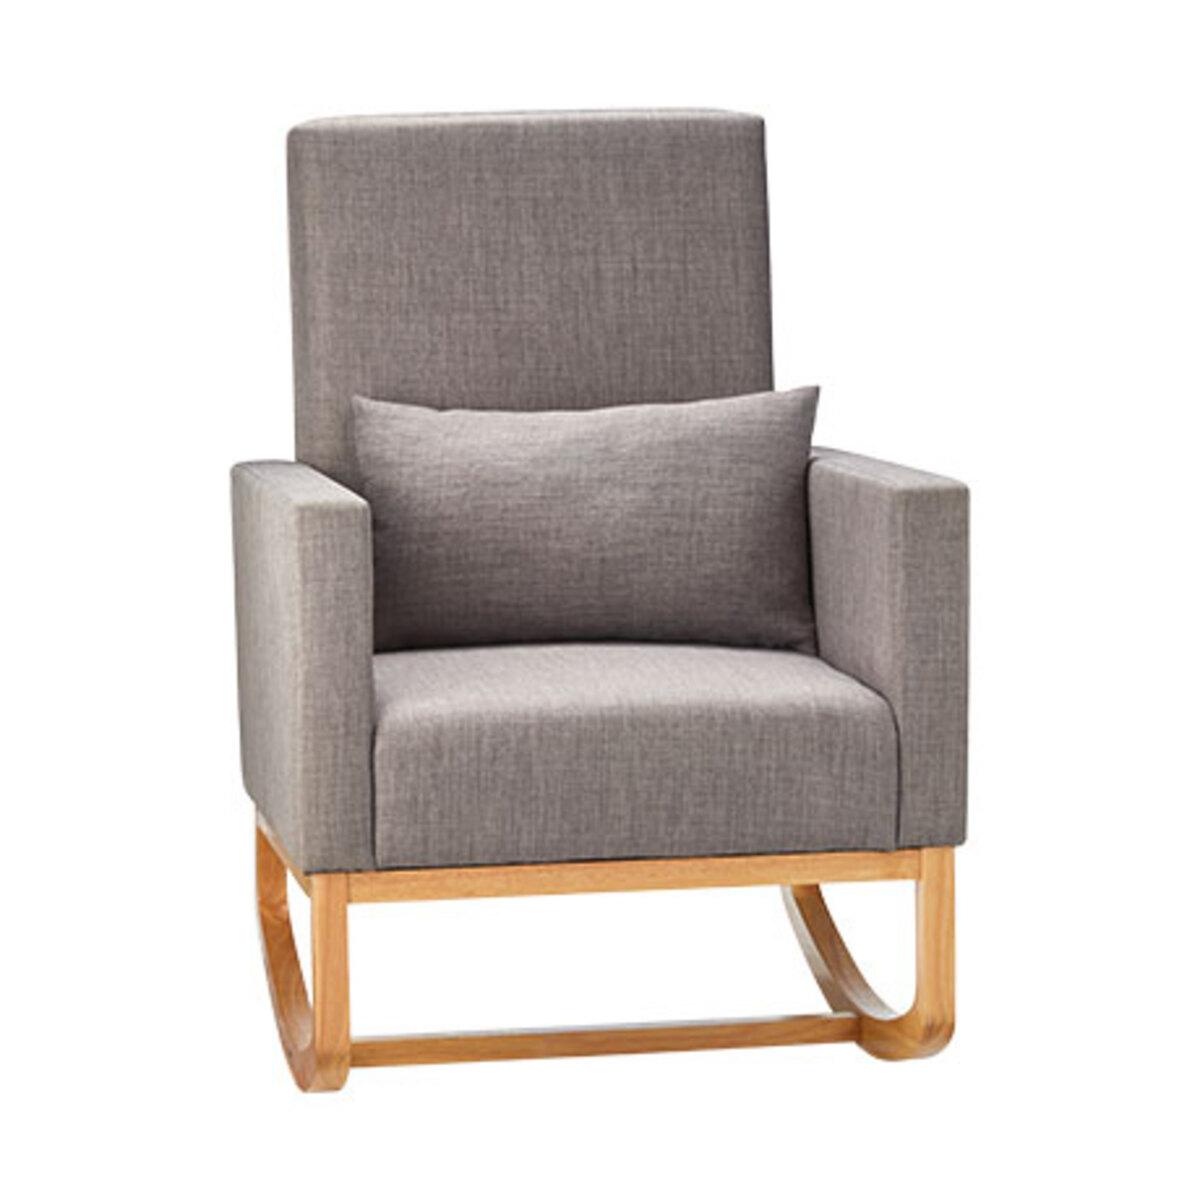 Bild 4 von 2-in-1 Schaukelstuhl-Sessel inkl. Zierkissen1